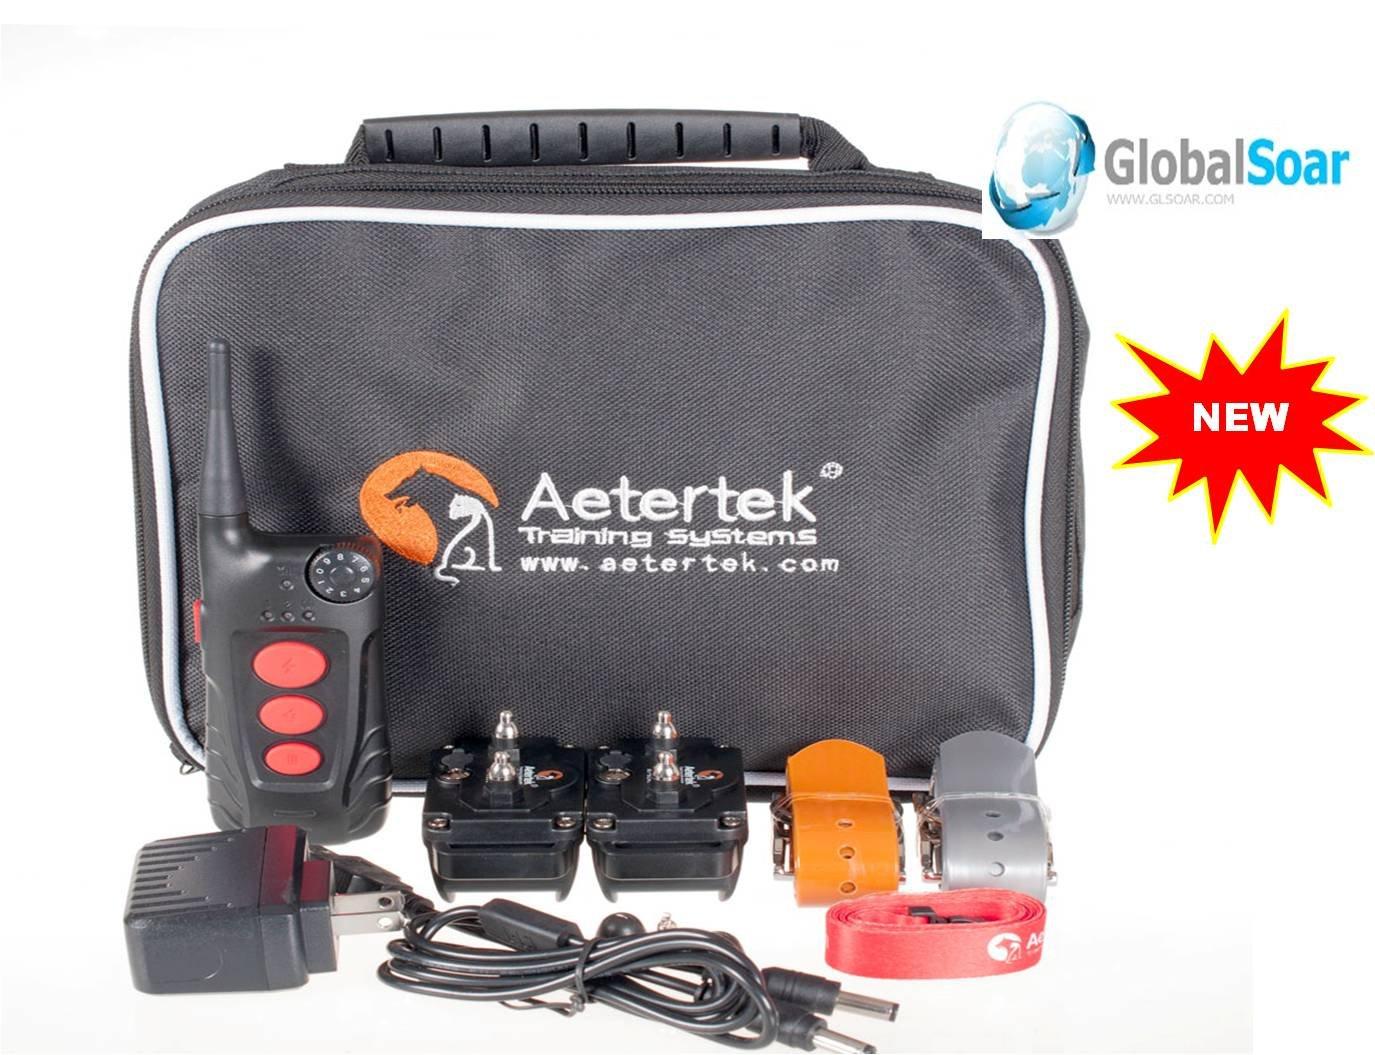 Aetertek 918C-2 600 Yard 9 Level 2 Dogs Training Anti Bark & Waterproof Collar